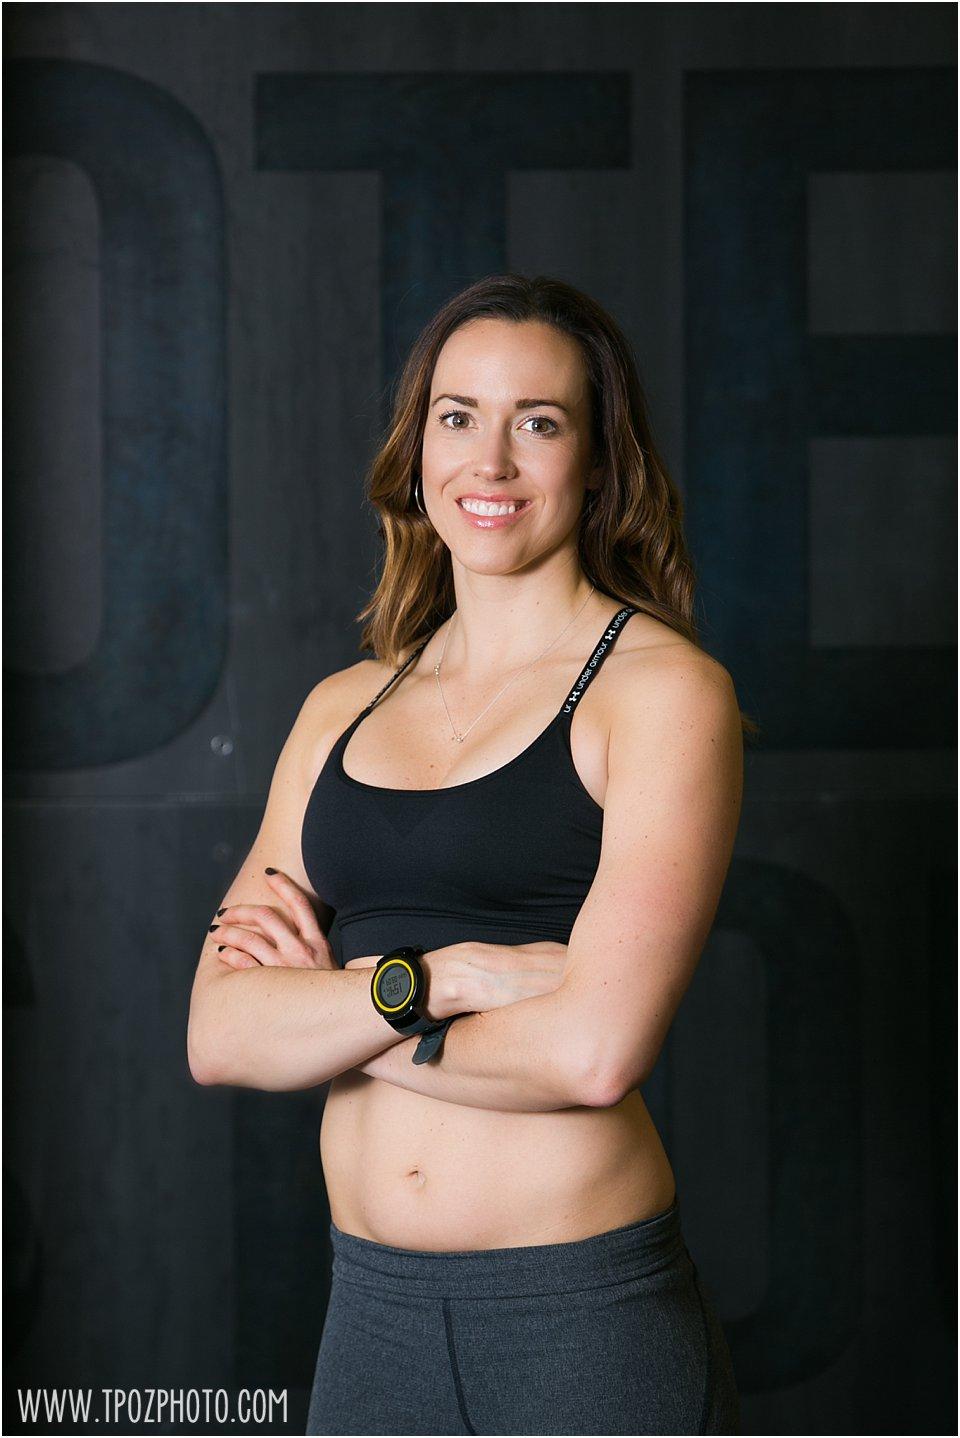 Heather-Hatfield-Fitness-Photos_0012